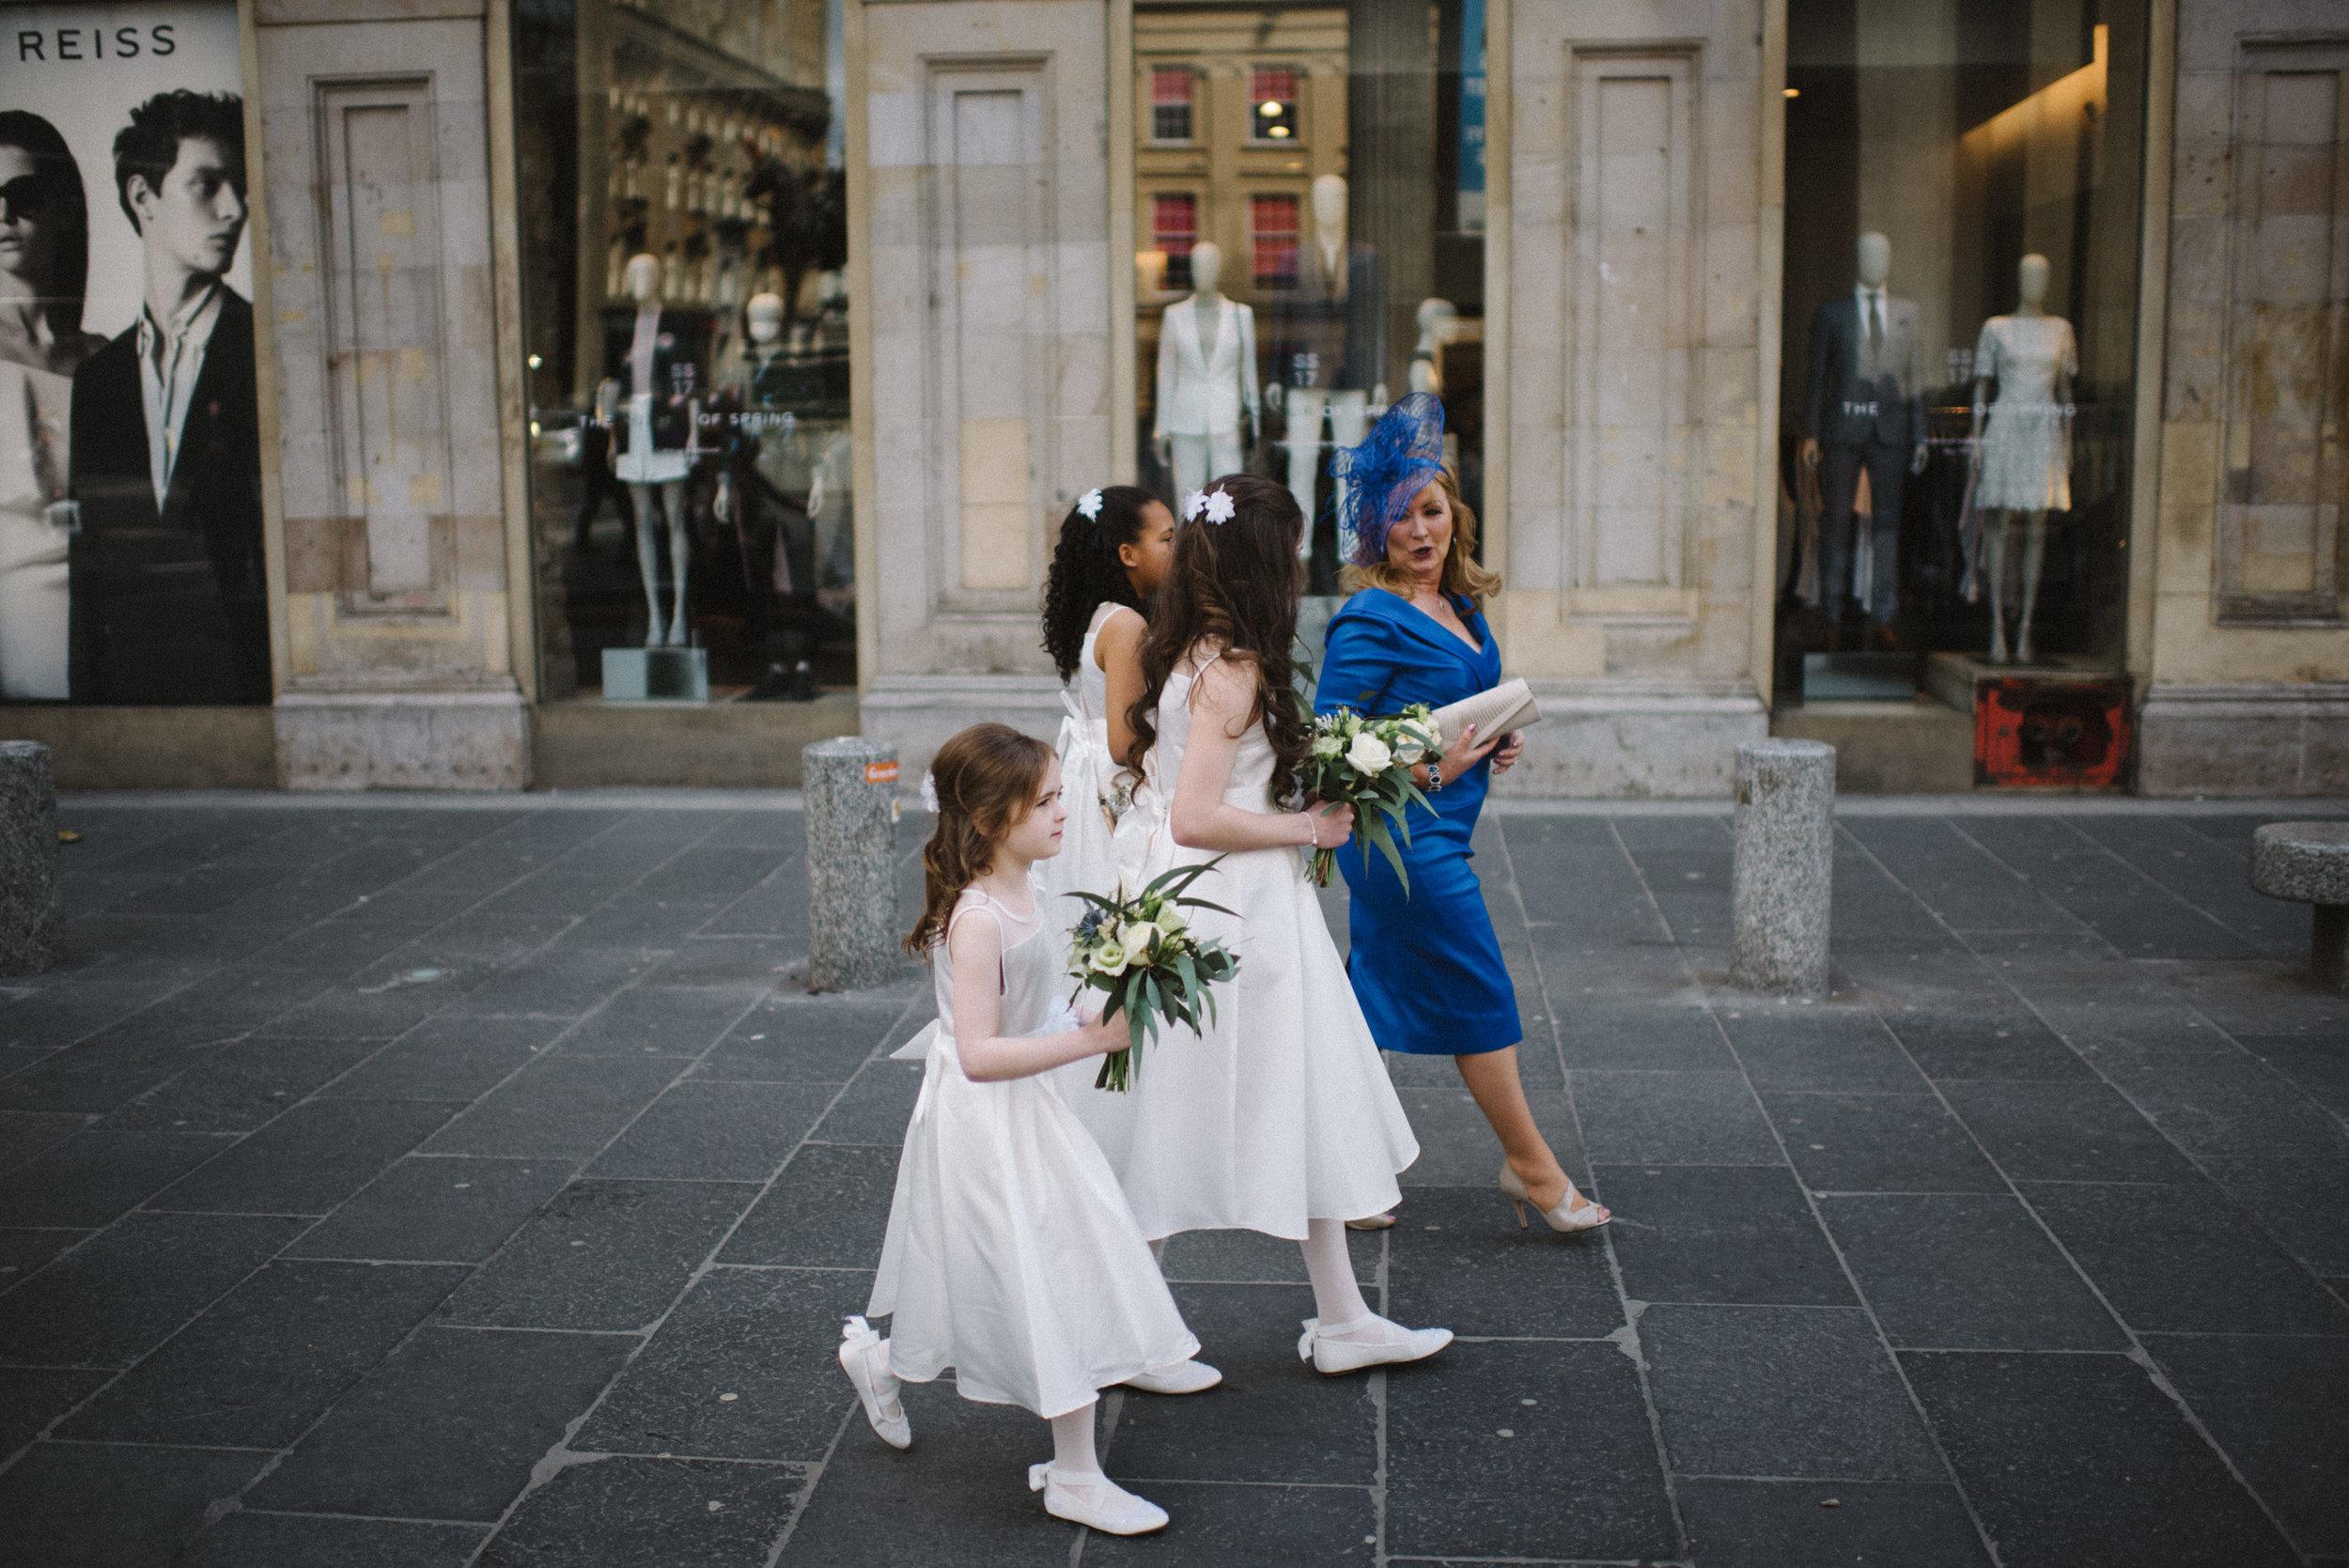 0115-LISA-DEVINE-PHOTOGRAPHY-ALTERNATIVE-WEDDING-PHOTOGRAPHY-SCOTLAND-DESTINATION-WEDDINGS-GLASGOW-WEDDINGS-COOL-WEDDINGS-STYLISH-WEDDINGS.JPG